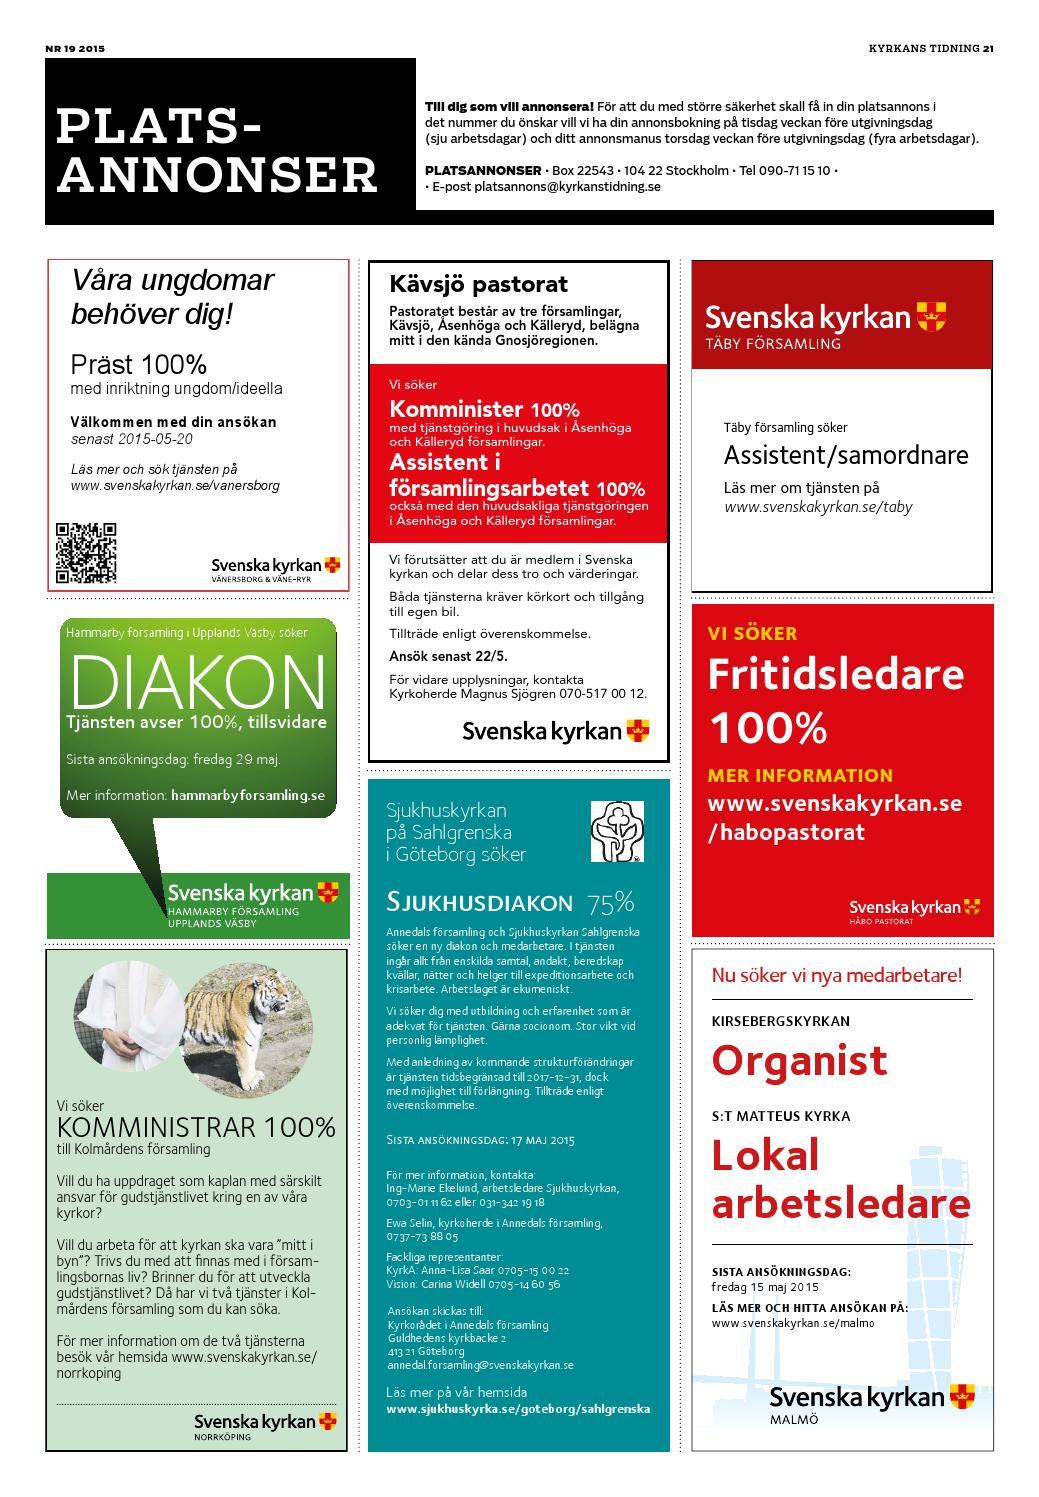 Helen Nilsson, 55 r i Hjltevad p Bergsgatan 5 - satisfaction-survey.net